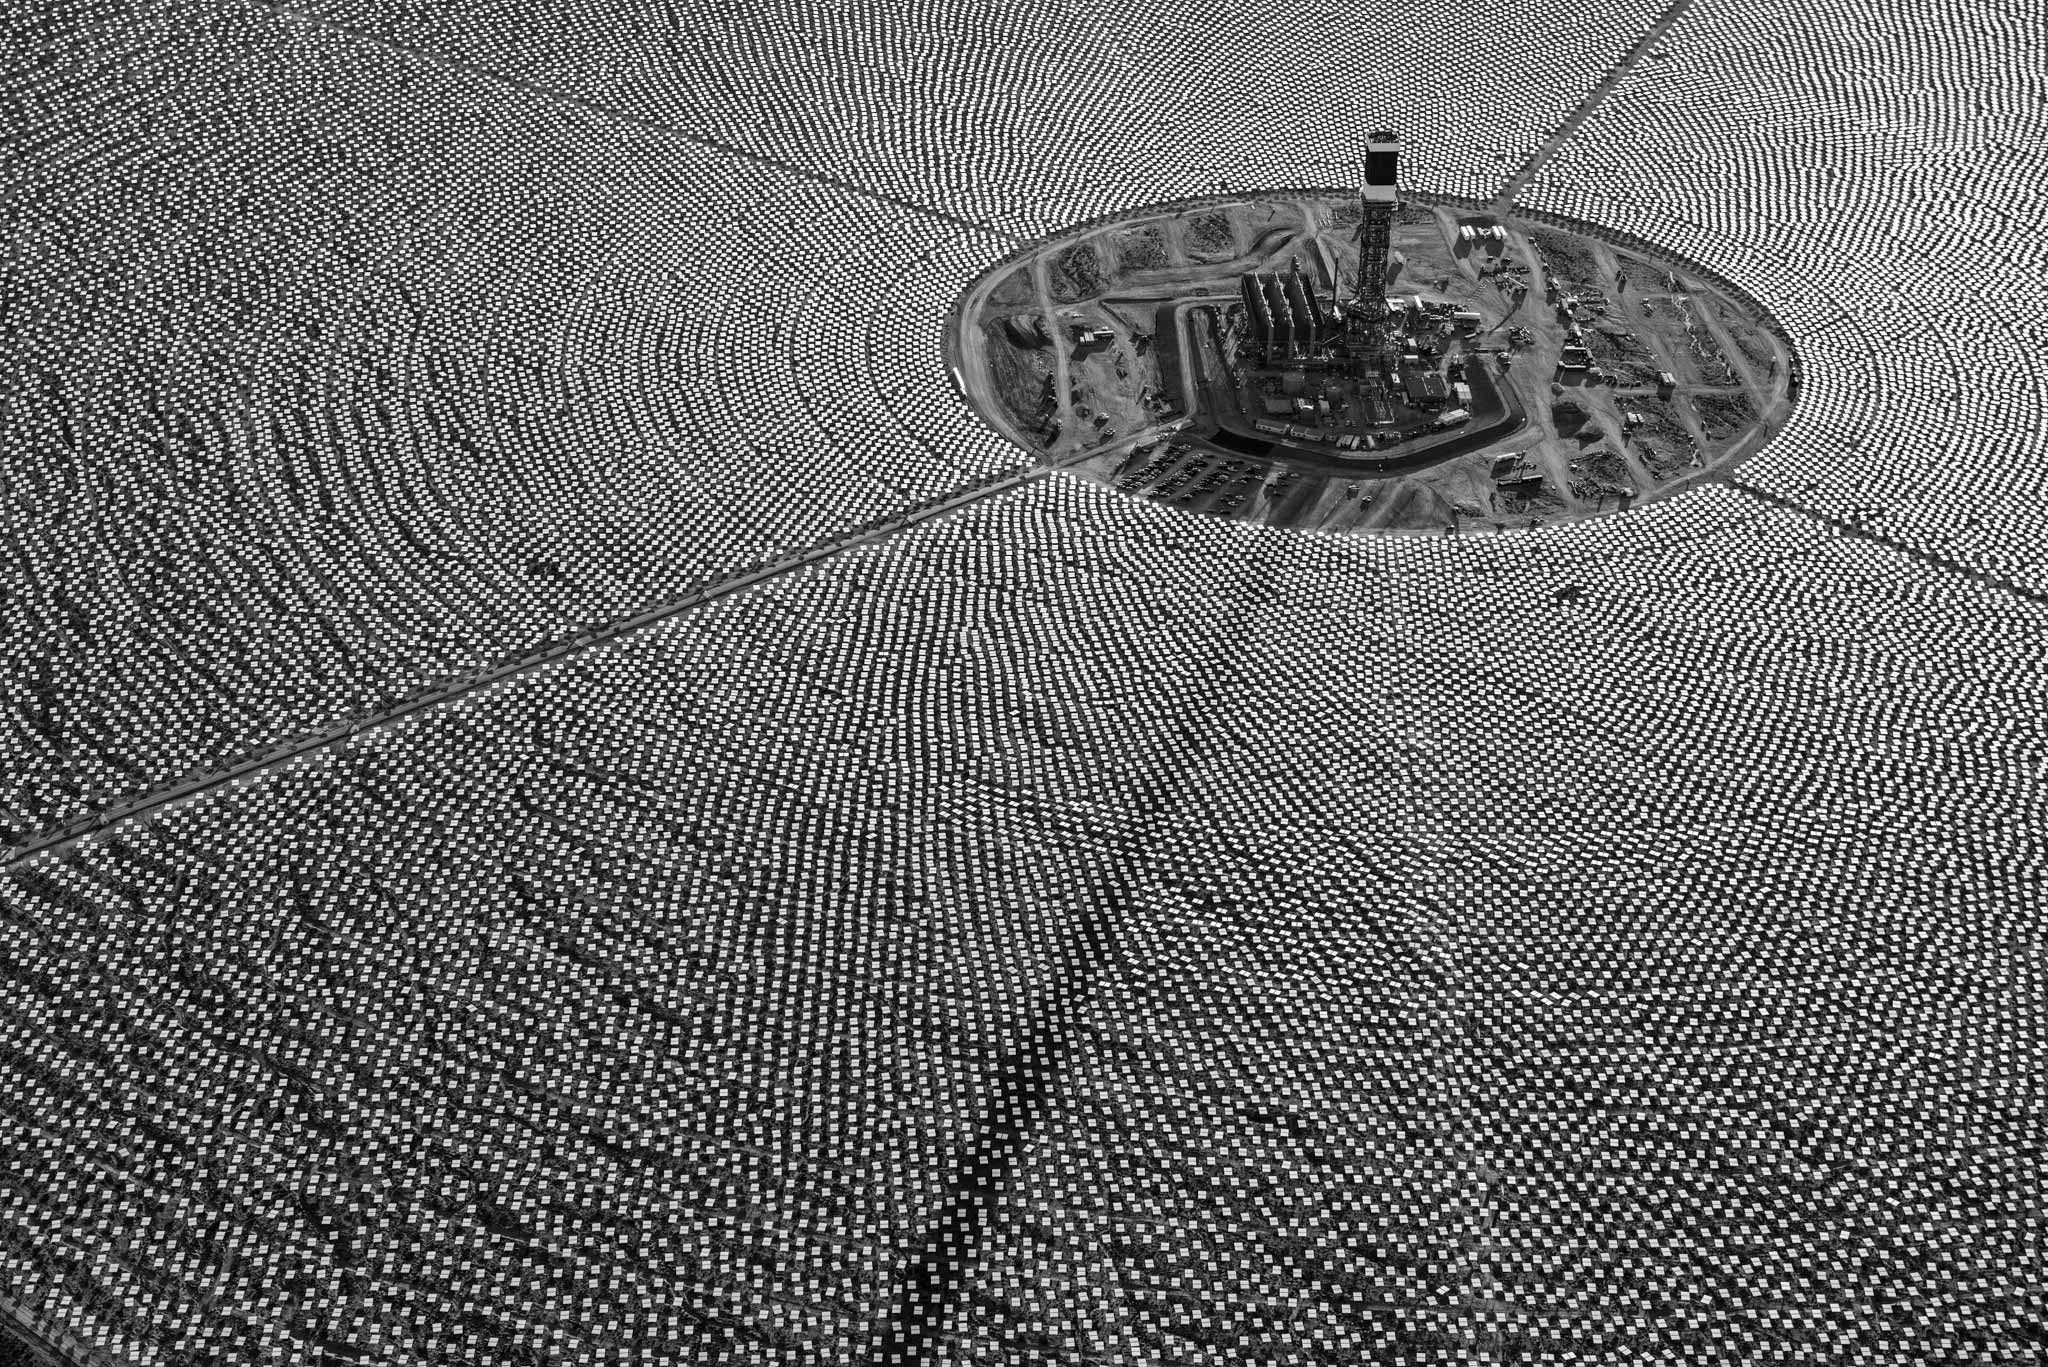 Ivanpah Solar Electric Facility Mojave Desert [2048x1367]